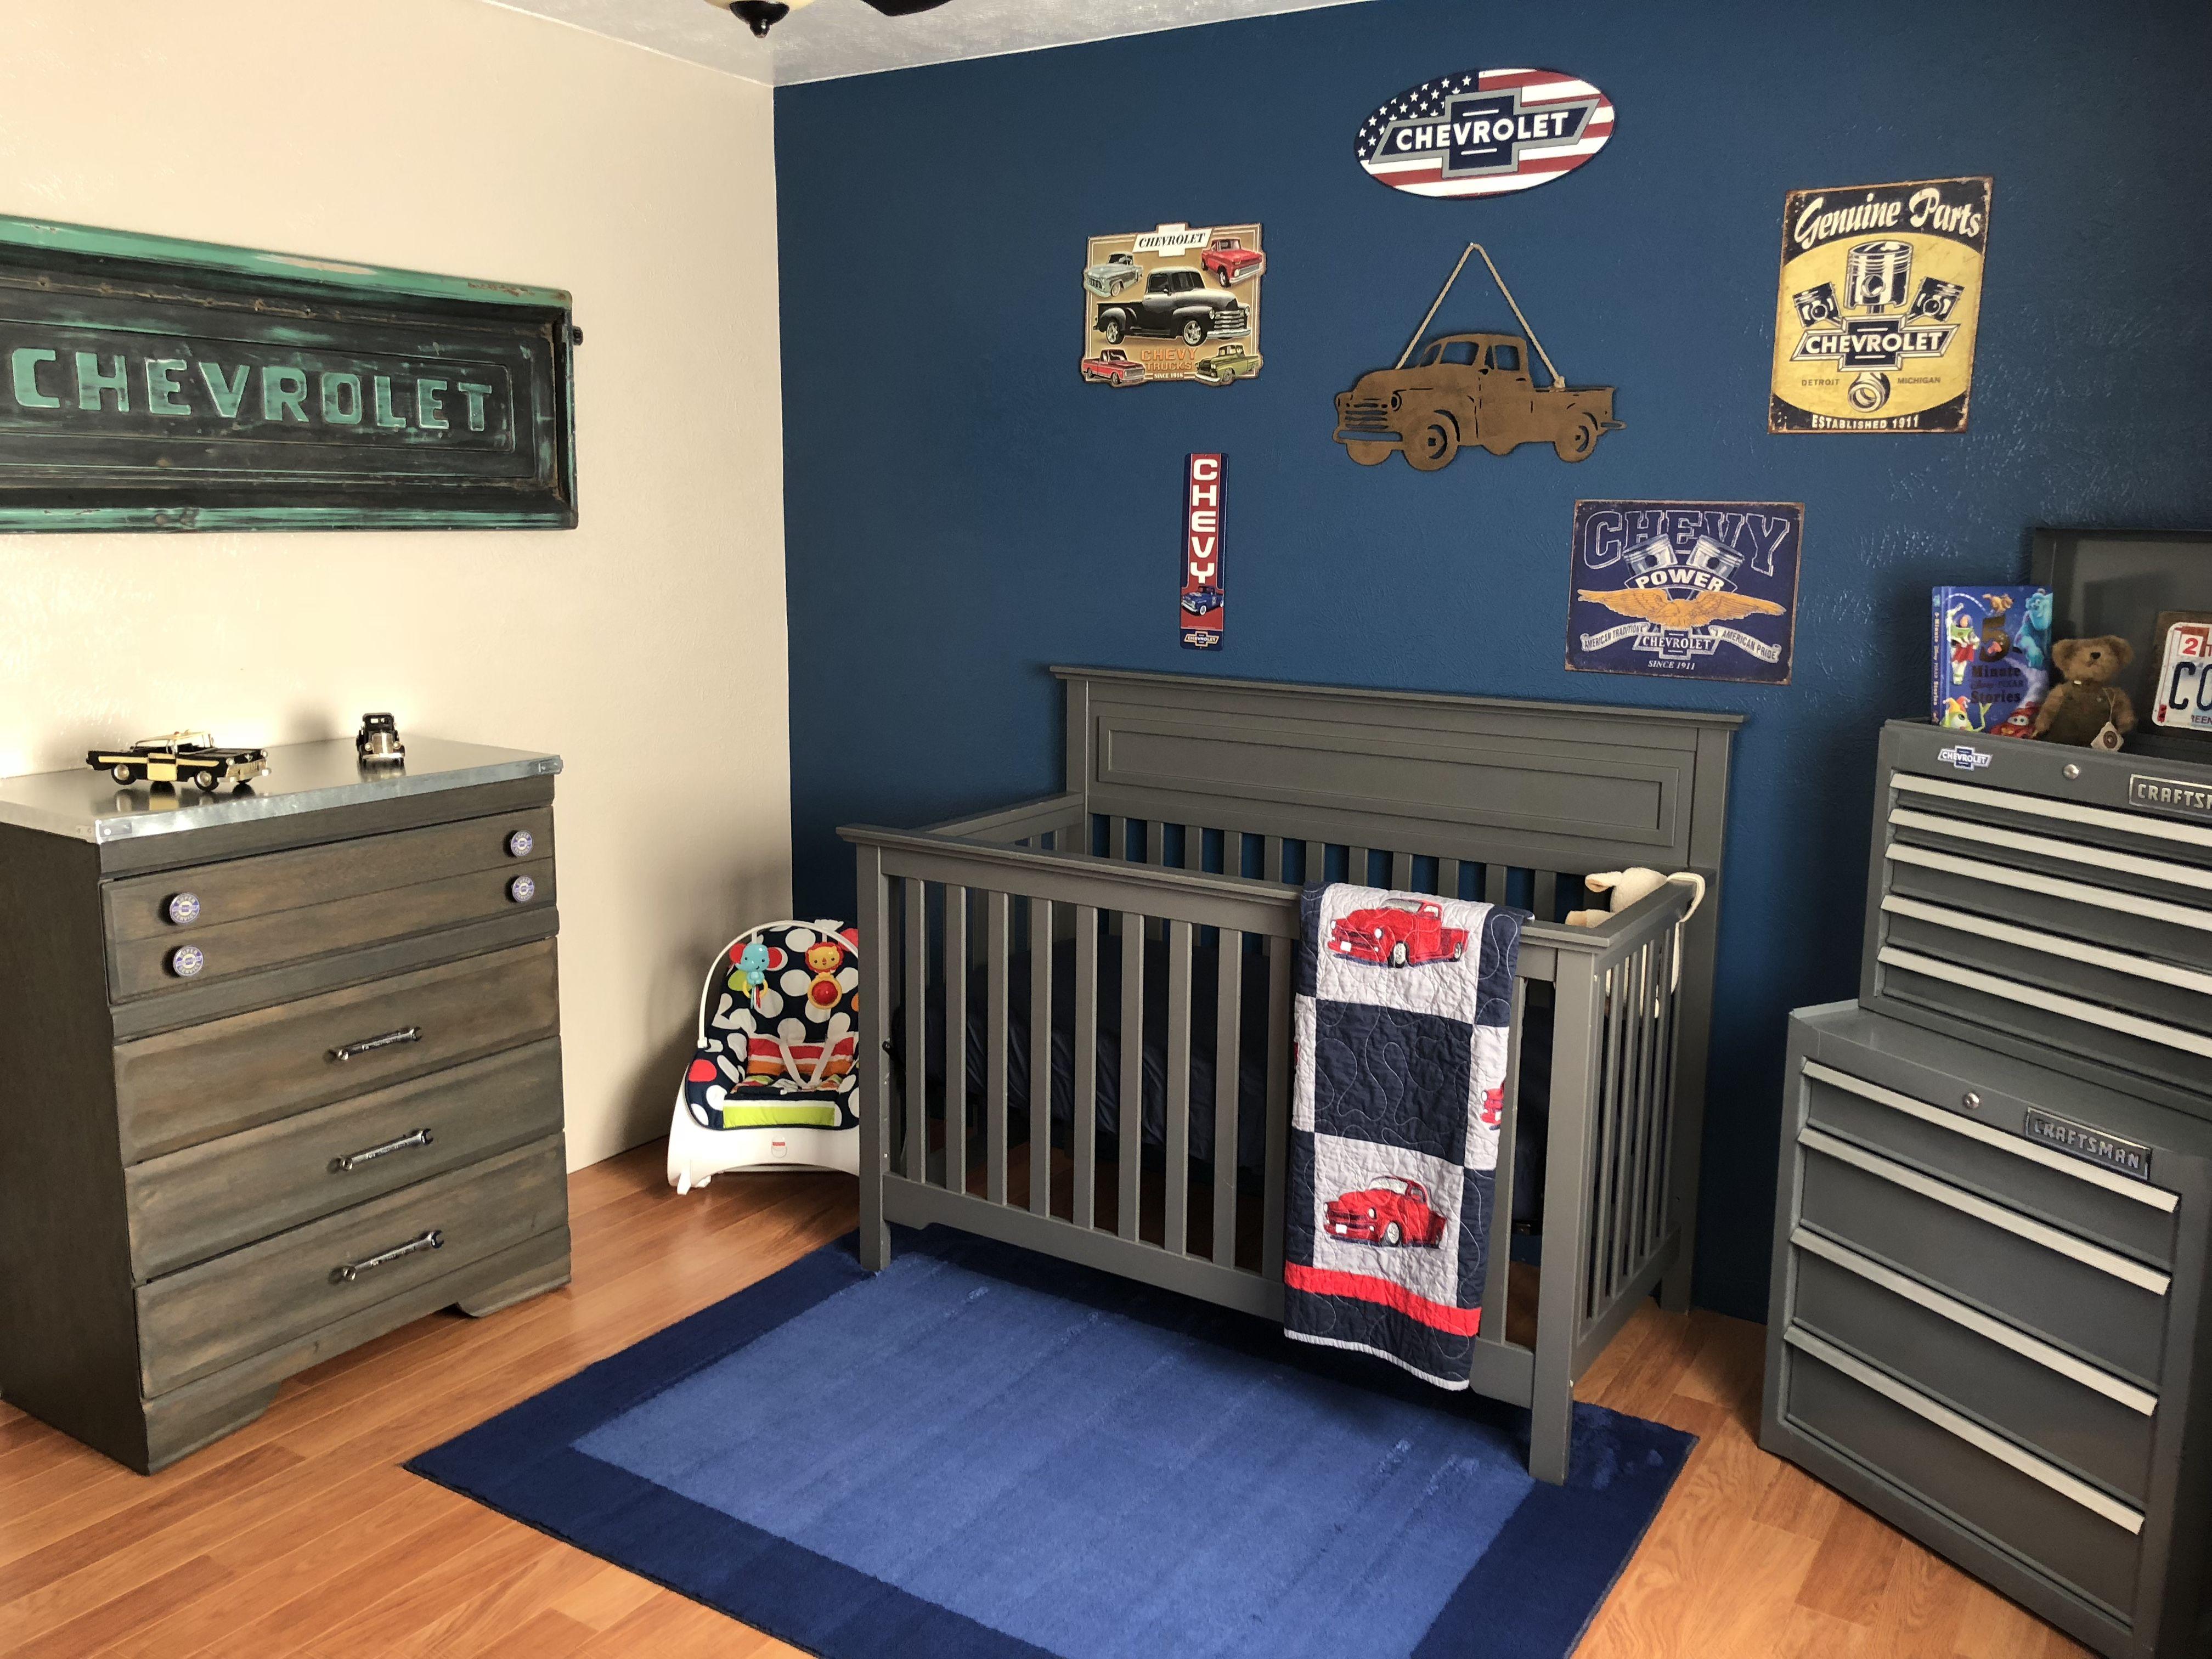 Stepside Chevy Tailgate Wall Art For Our Nursery Vintage Chevy Truck Nursery Vintage Truck Nursery Baby Boy Room Nursery Car Themed Nursery